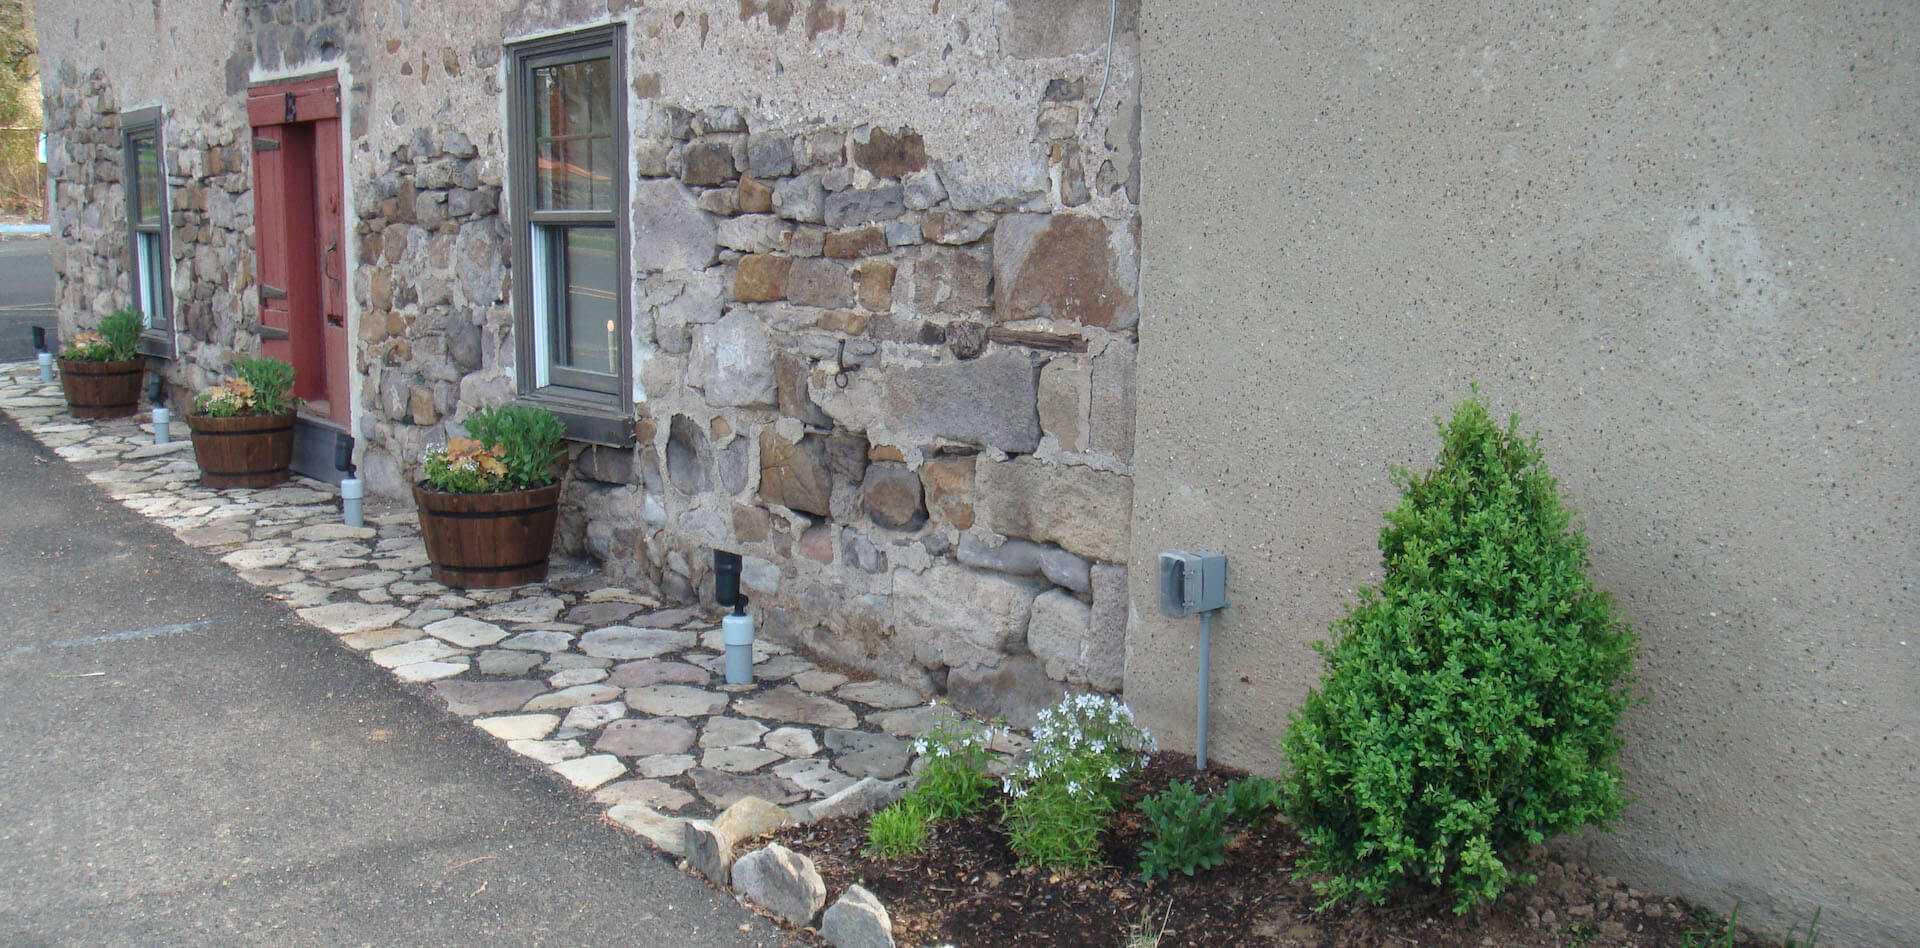 flower beds alongside edge of stone wall